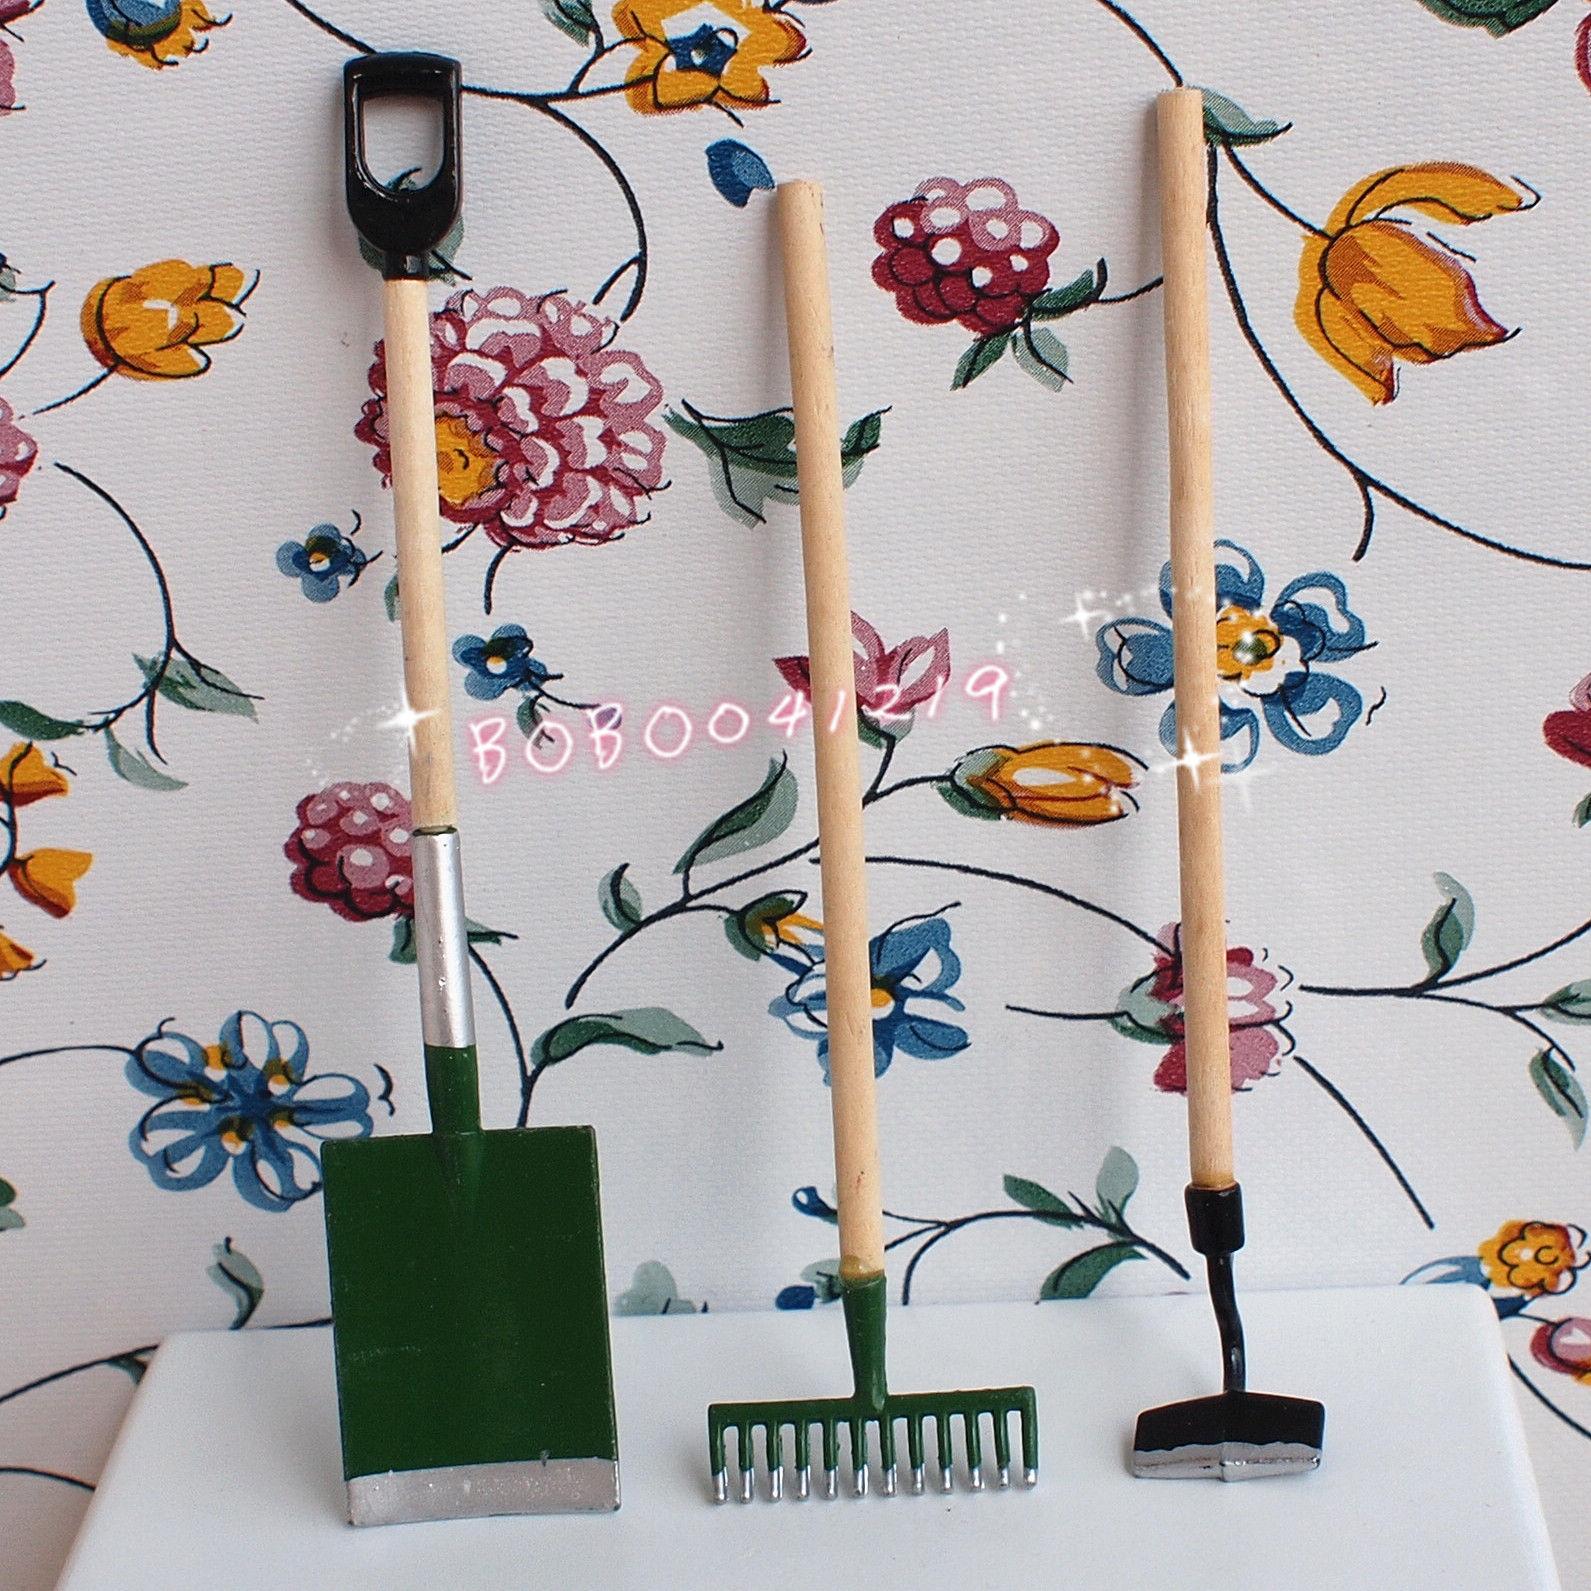 Dollhouse Miniature 1:12 Toy Metal Blue 3 Pieces Garden Tools Length 10cm J3